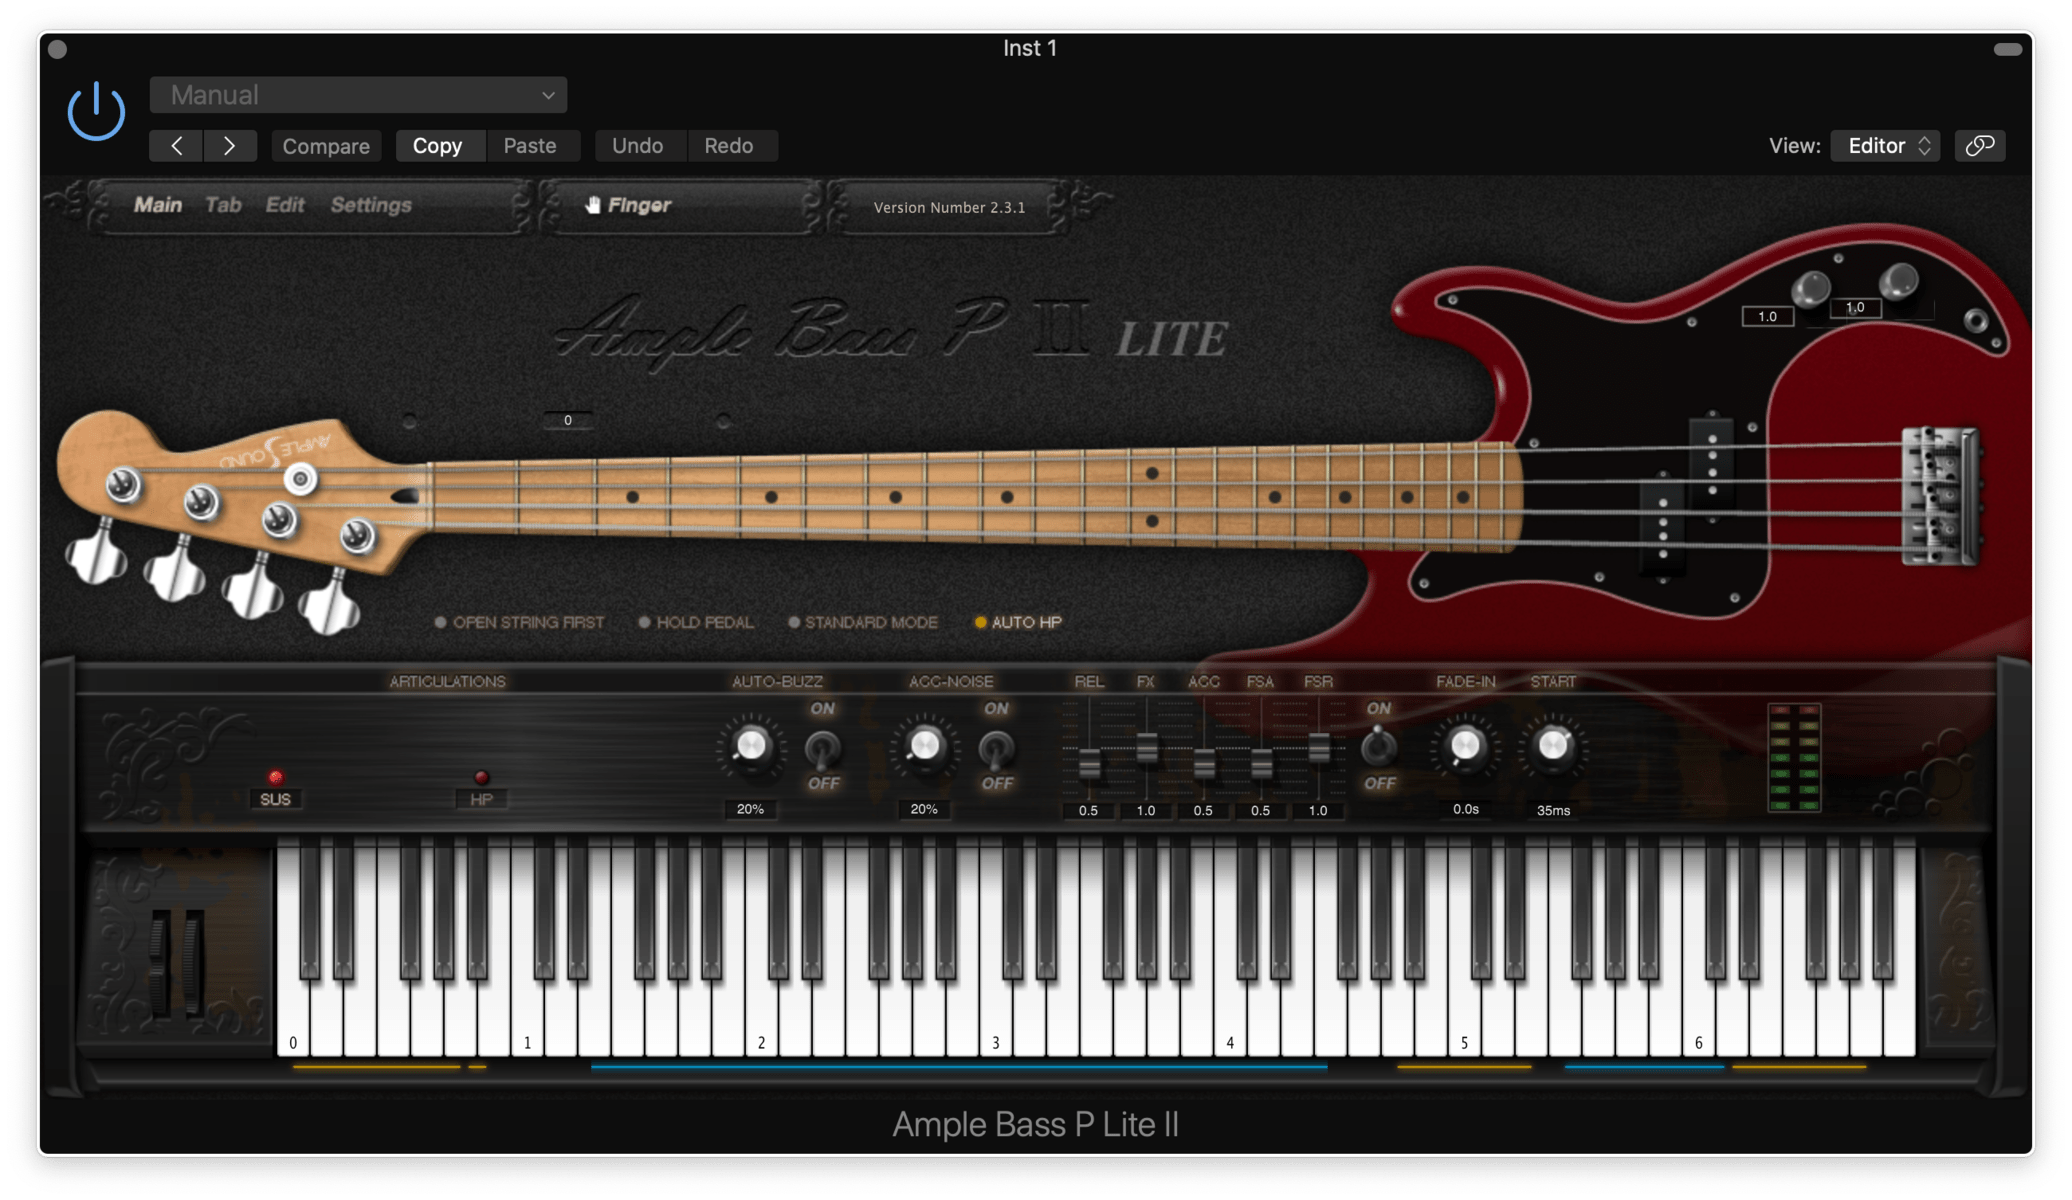 Ample Bass P Lite II